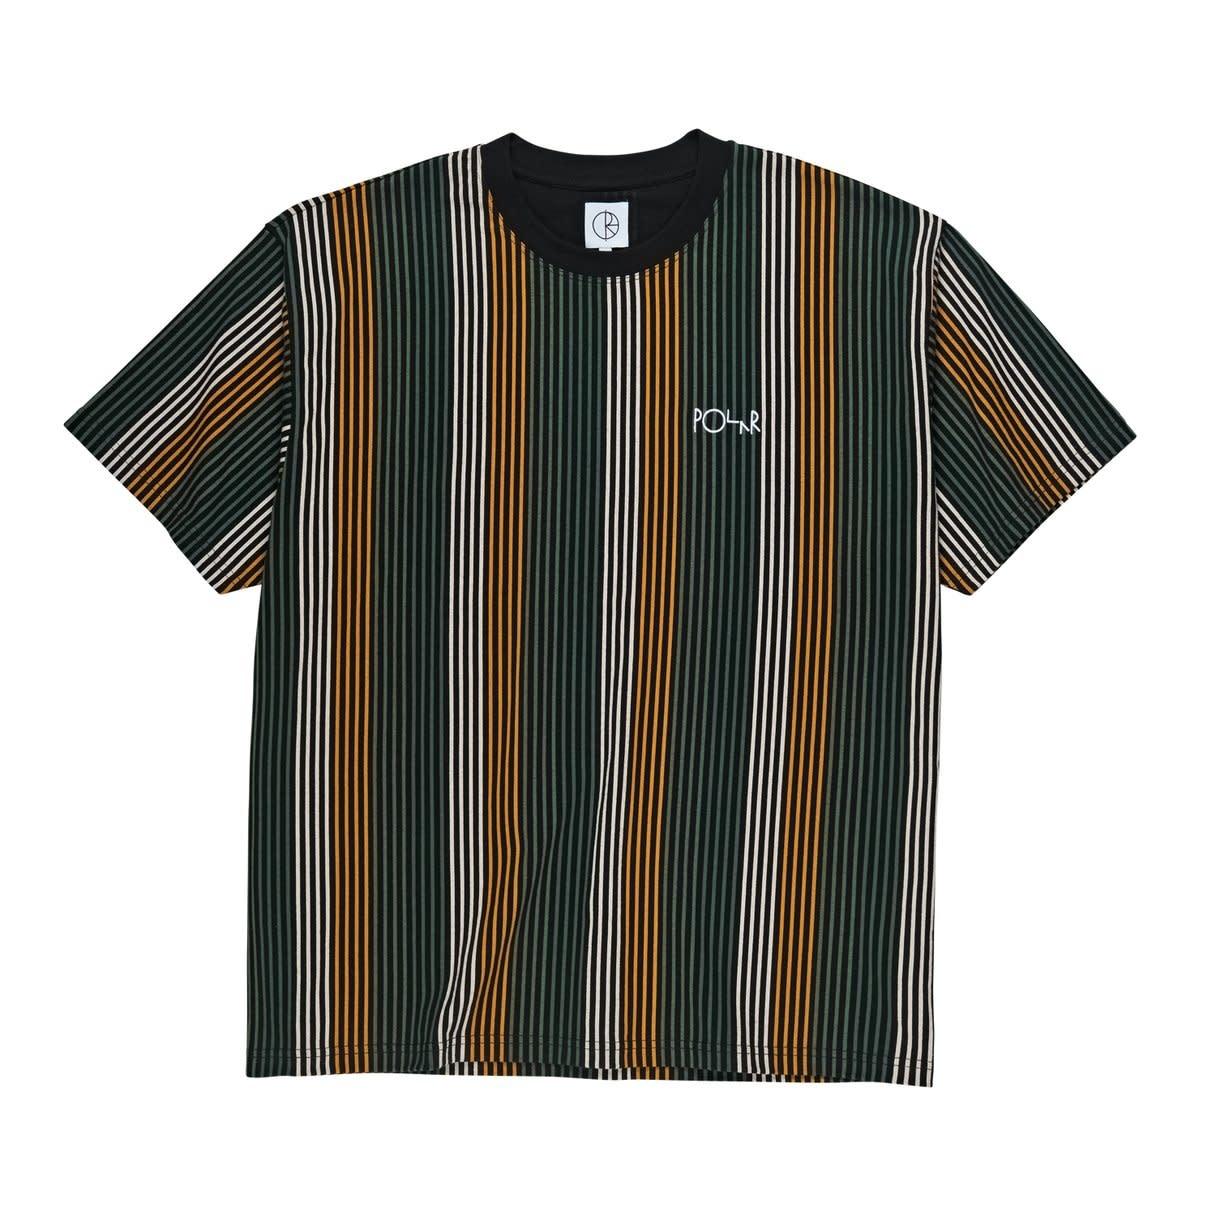 Polar Skate Co. Multi-Colour Tee Black/Multi